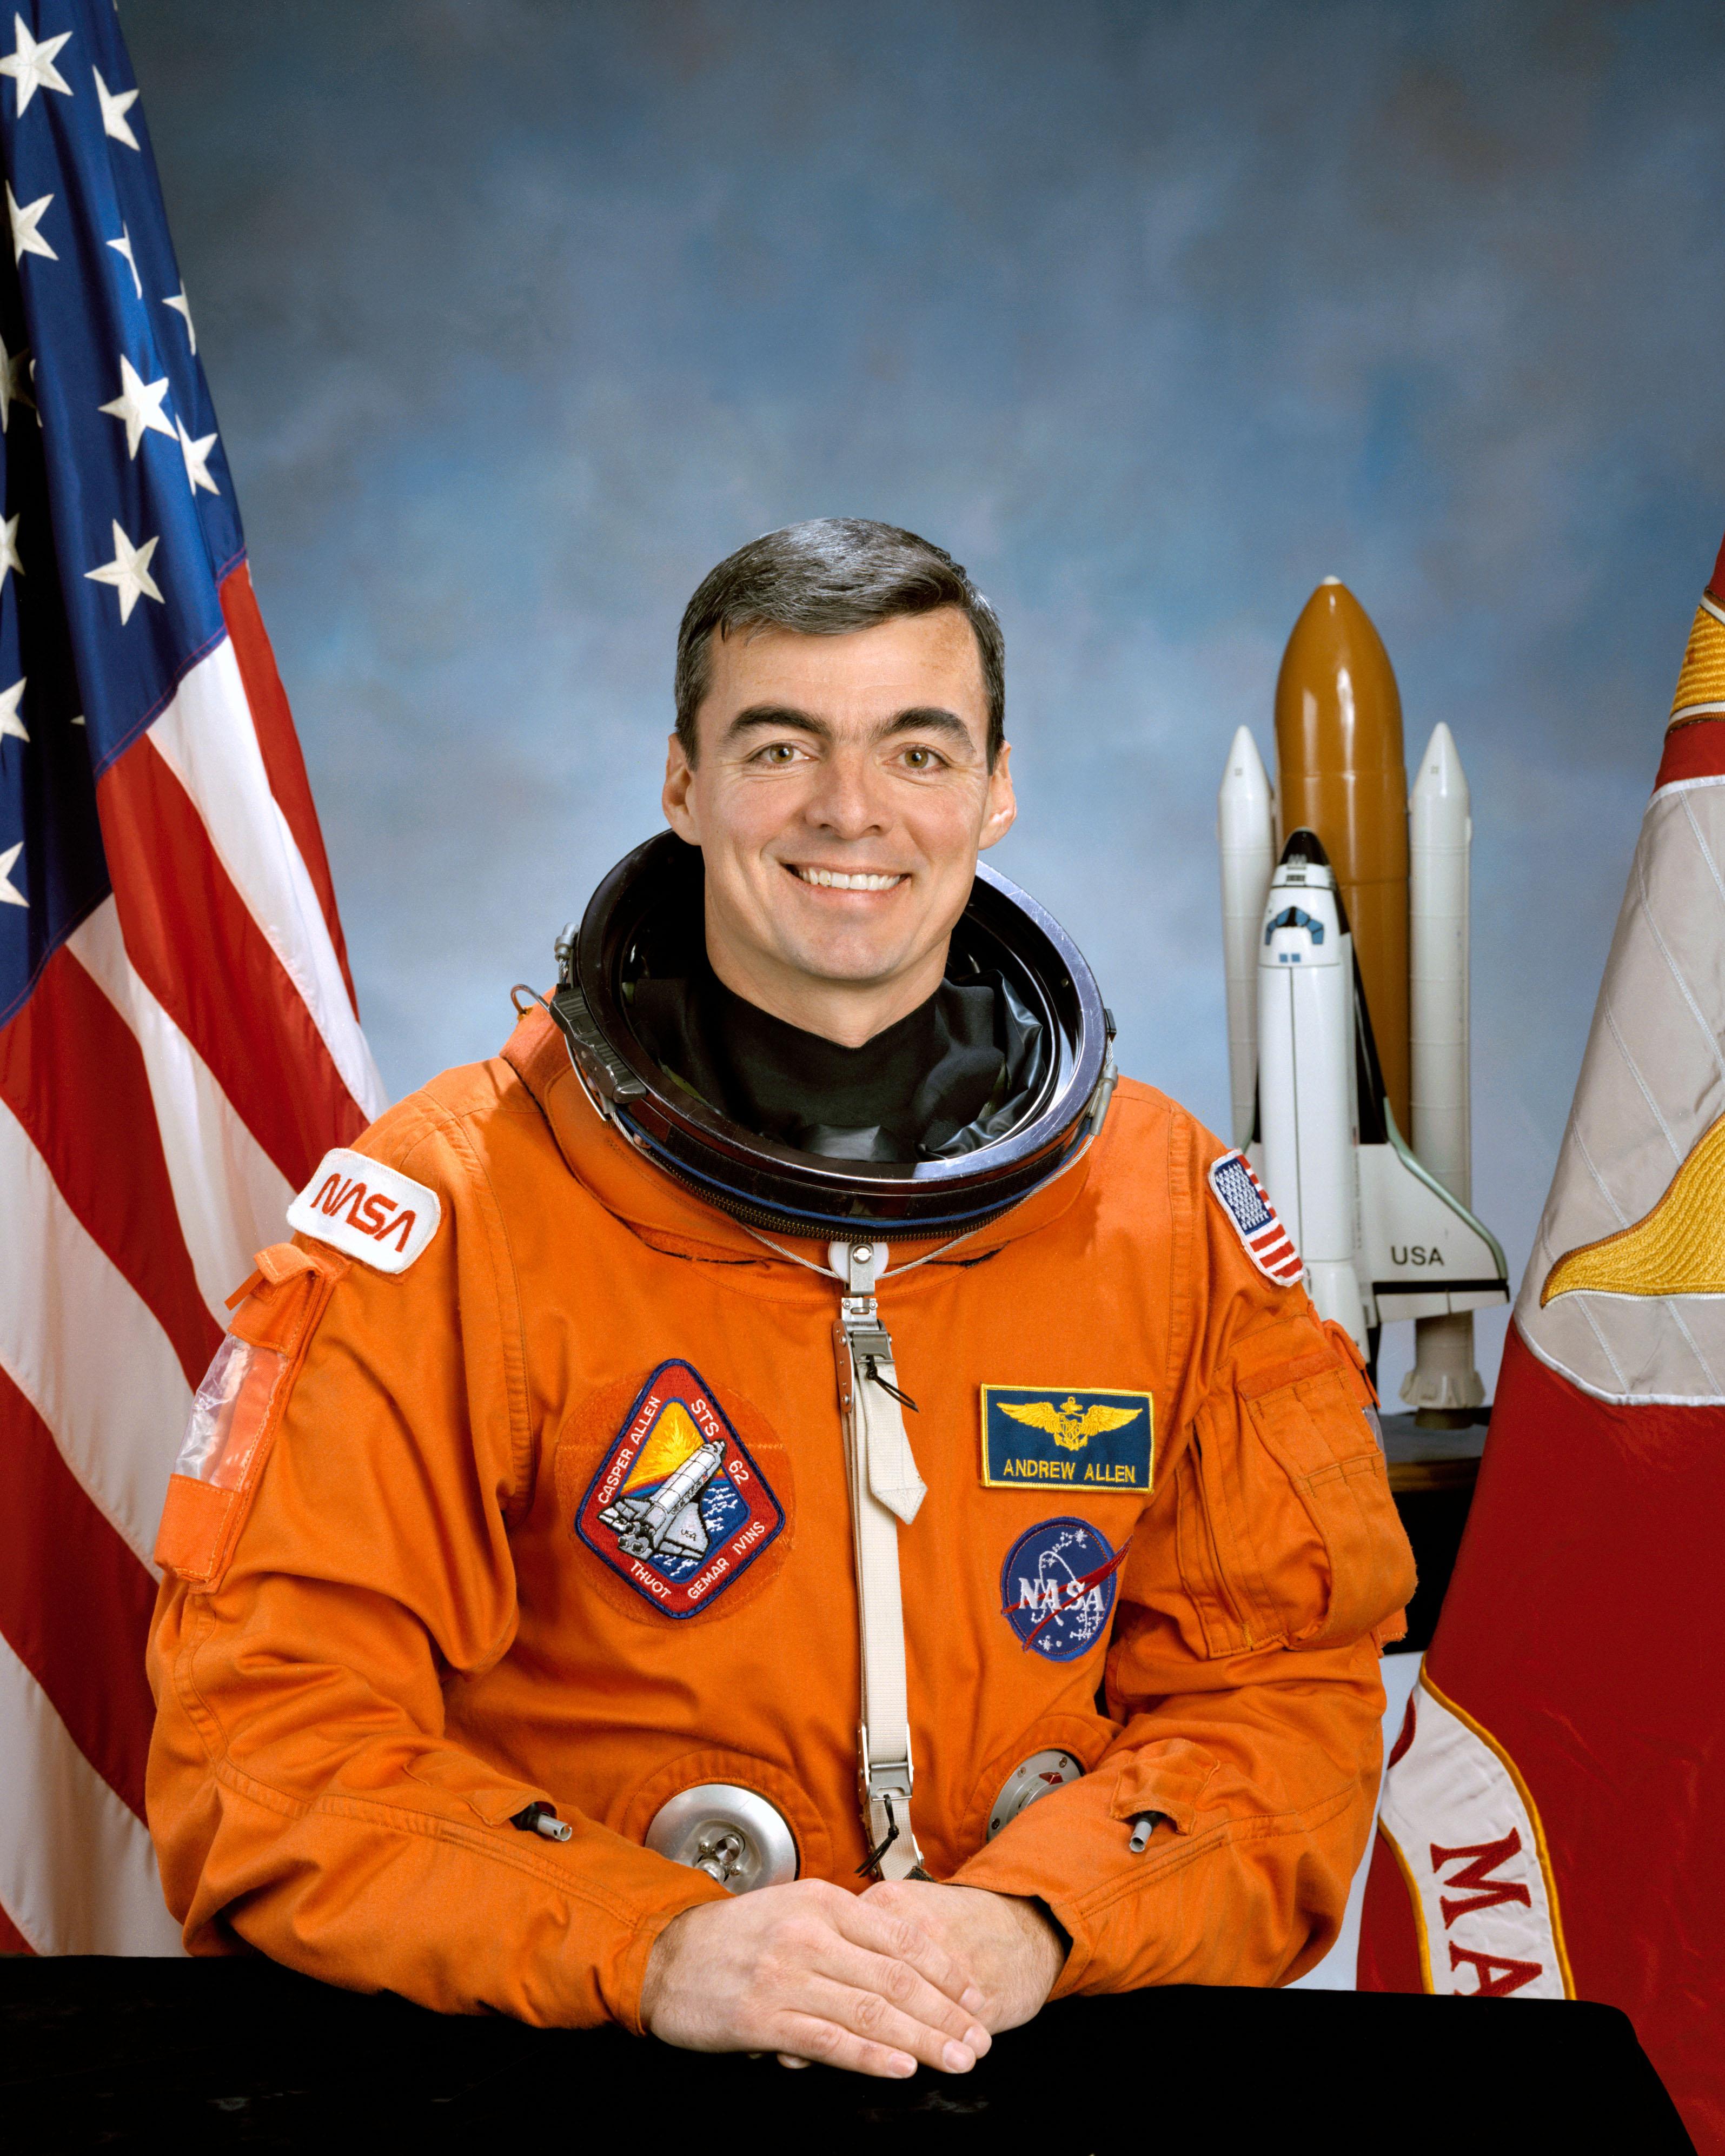 astronaut corps - photo #47